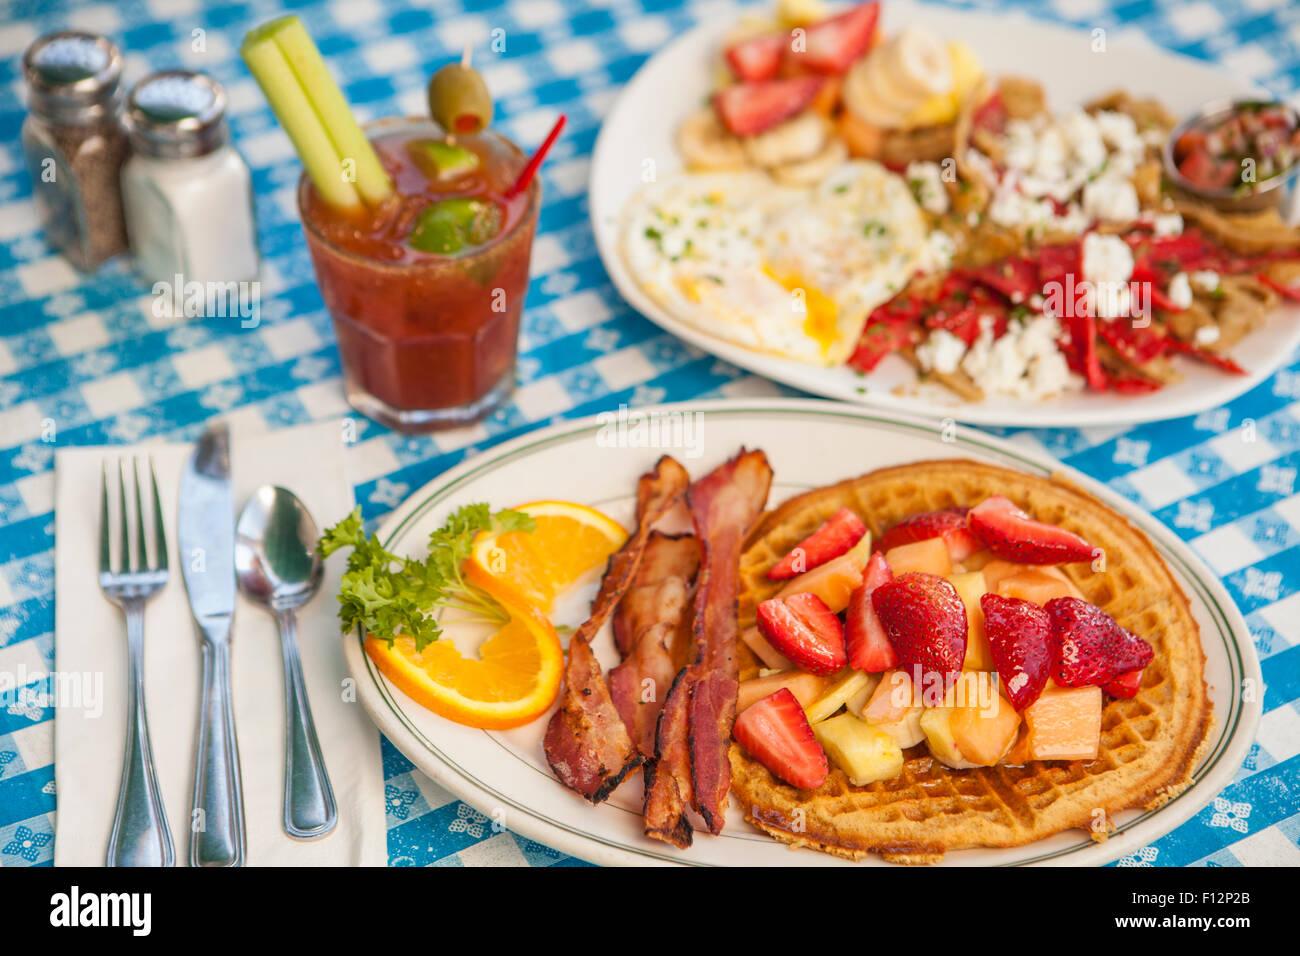 O.J.chiacchiere con pancetta, Huevos Paradiso e un Bloody Mary, il Paradise Cafe, Santa Barbara, California Foto Stock